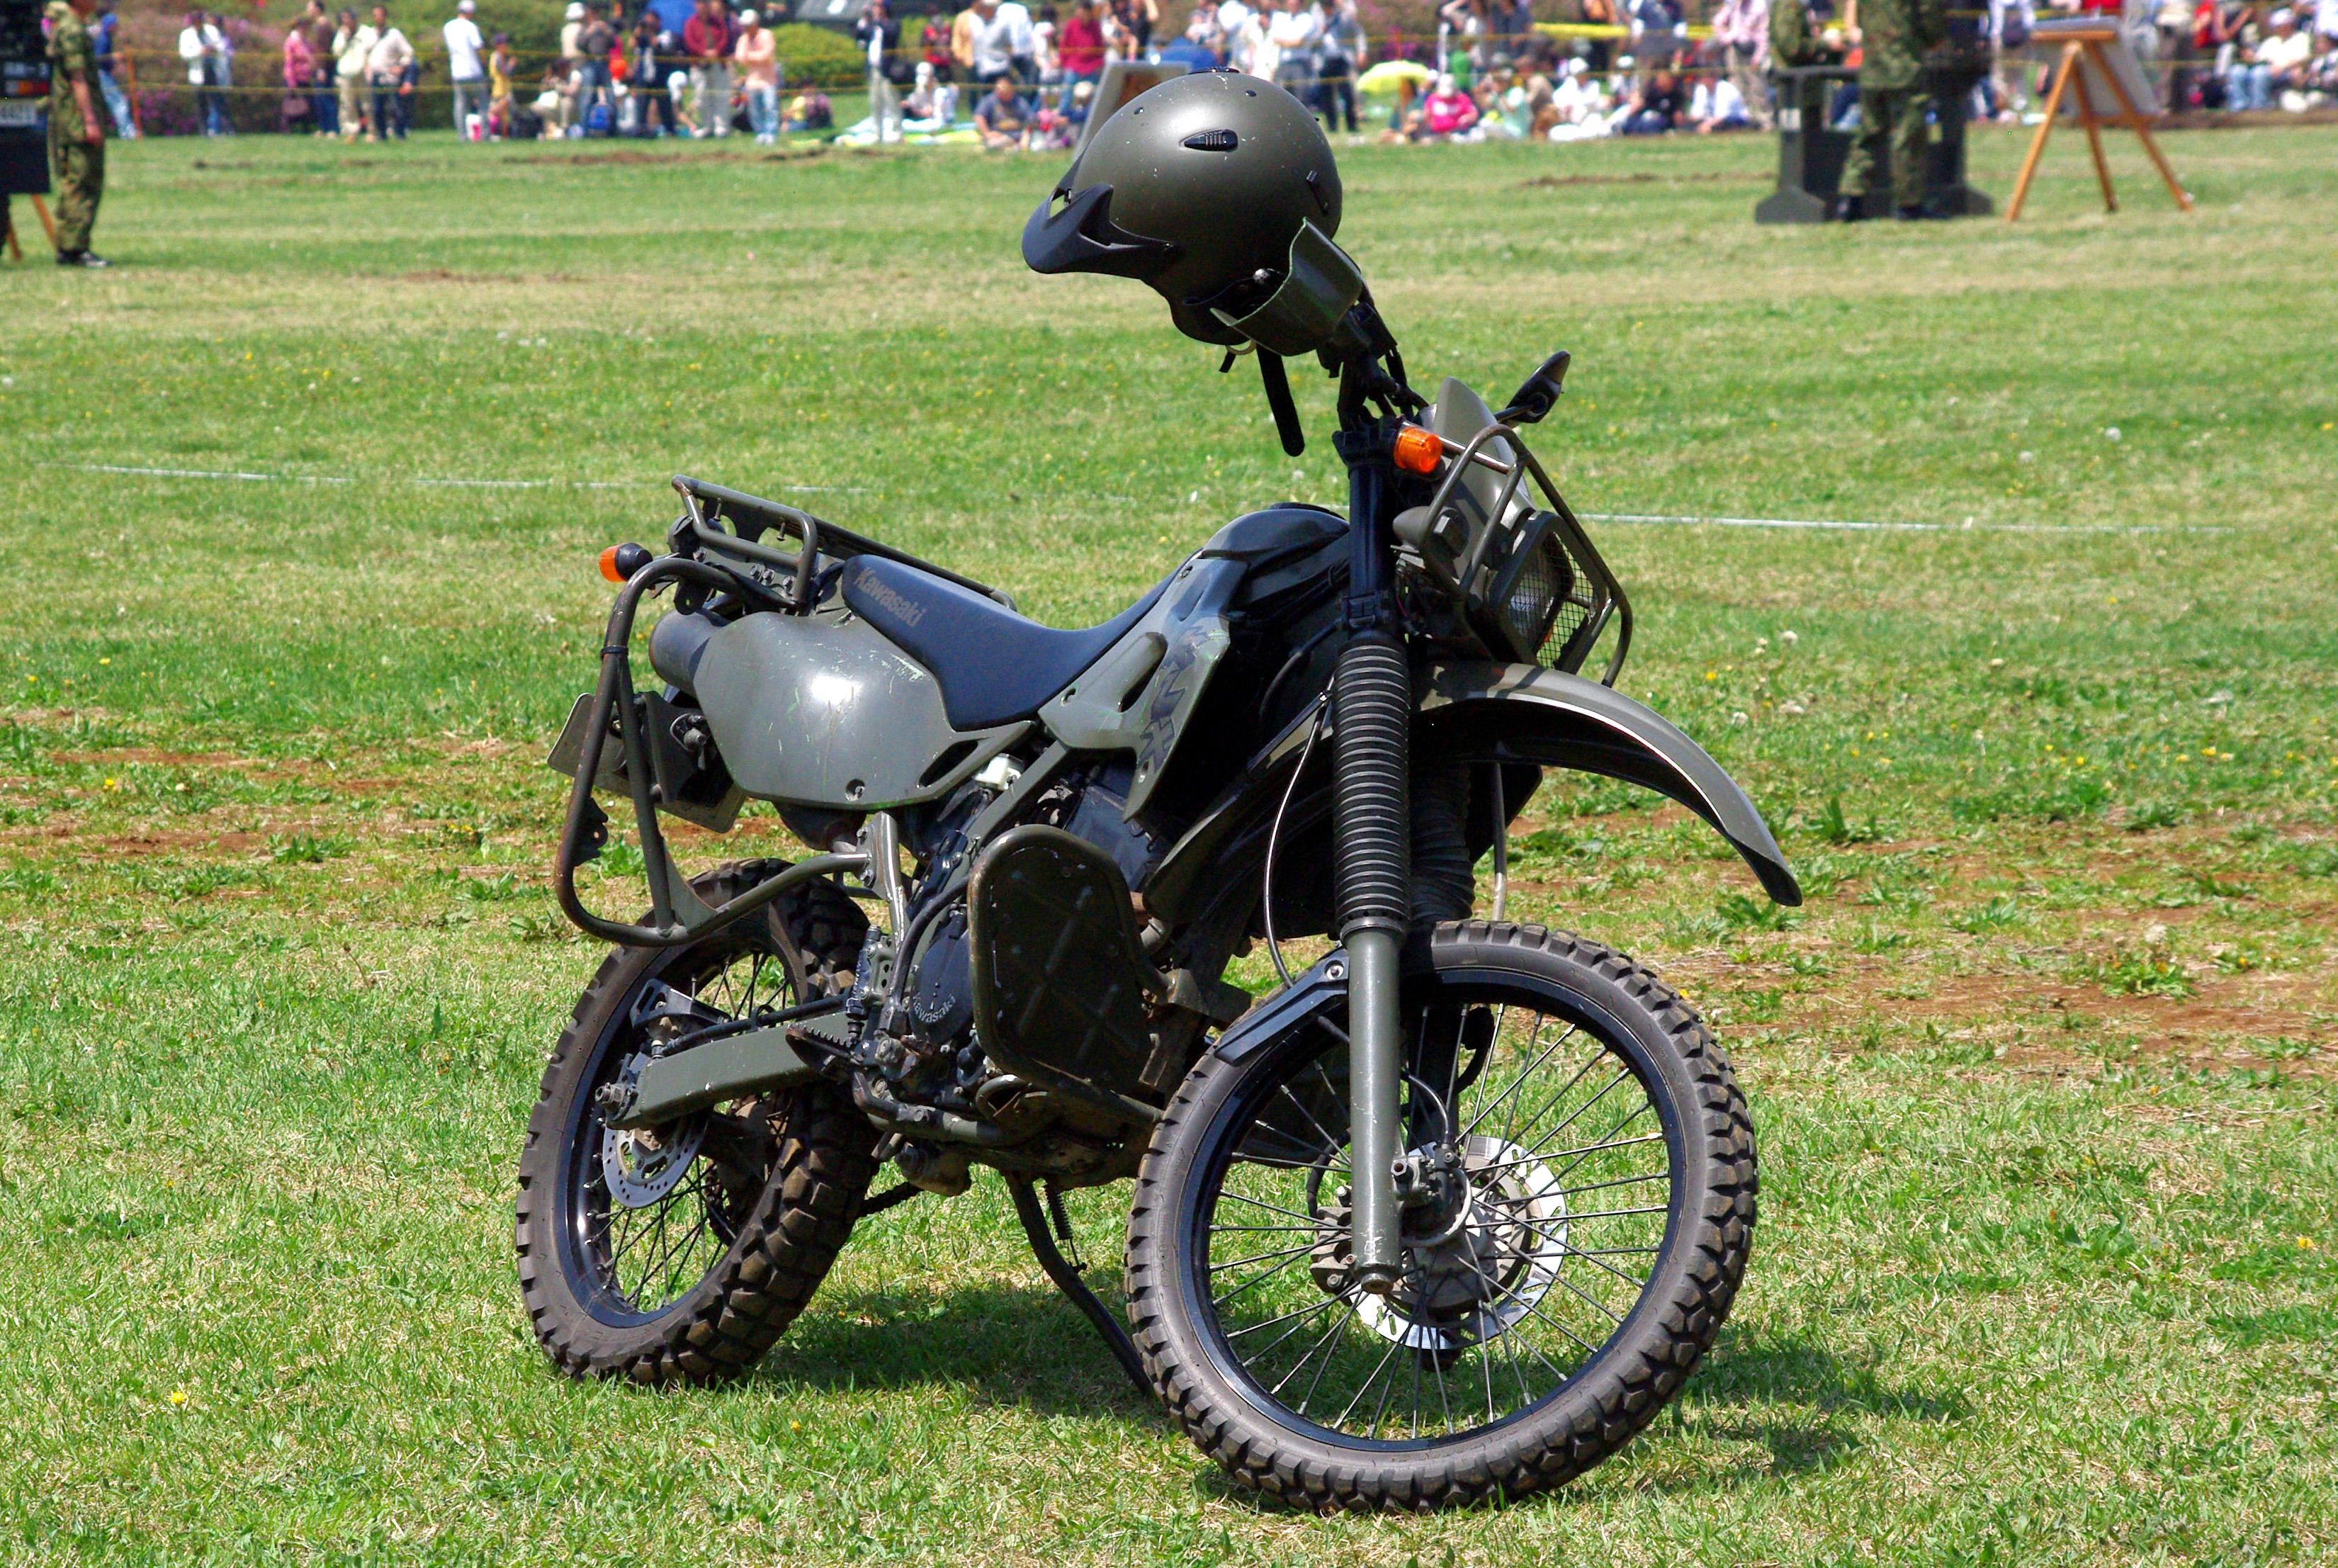 File:JGSDF reconnaissance bicycle (Kawasaki KLX250 ...